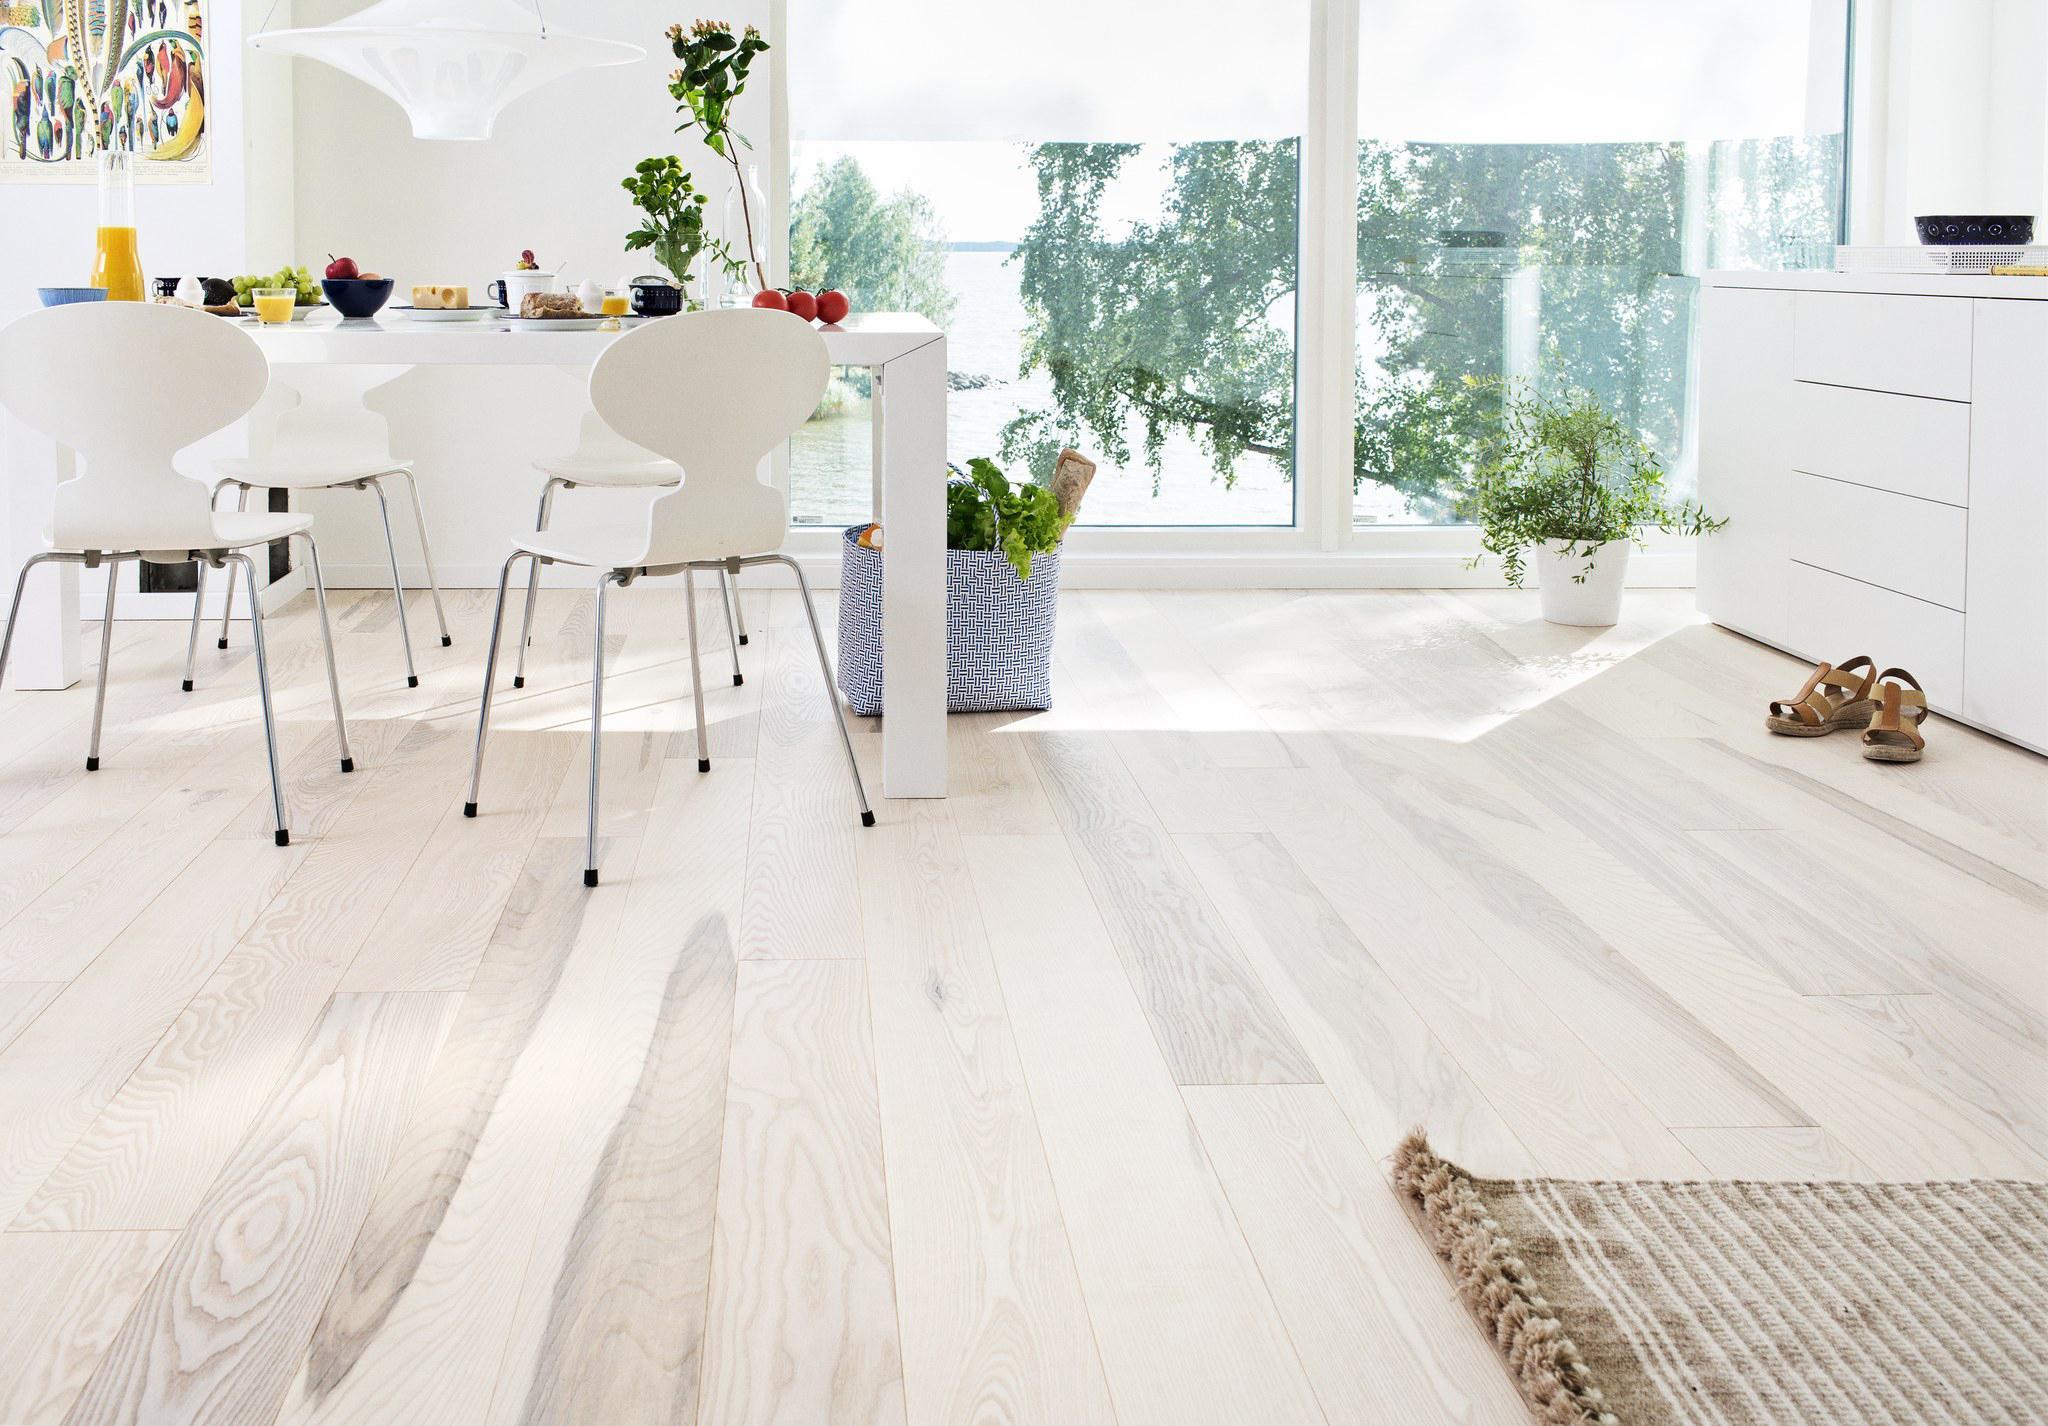 Timberwise-saarni-ash-olive-hiottu-sand-valkomattalakattu-white-matt-lacquered